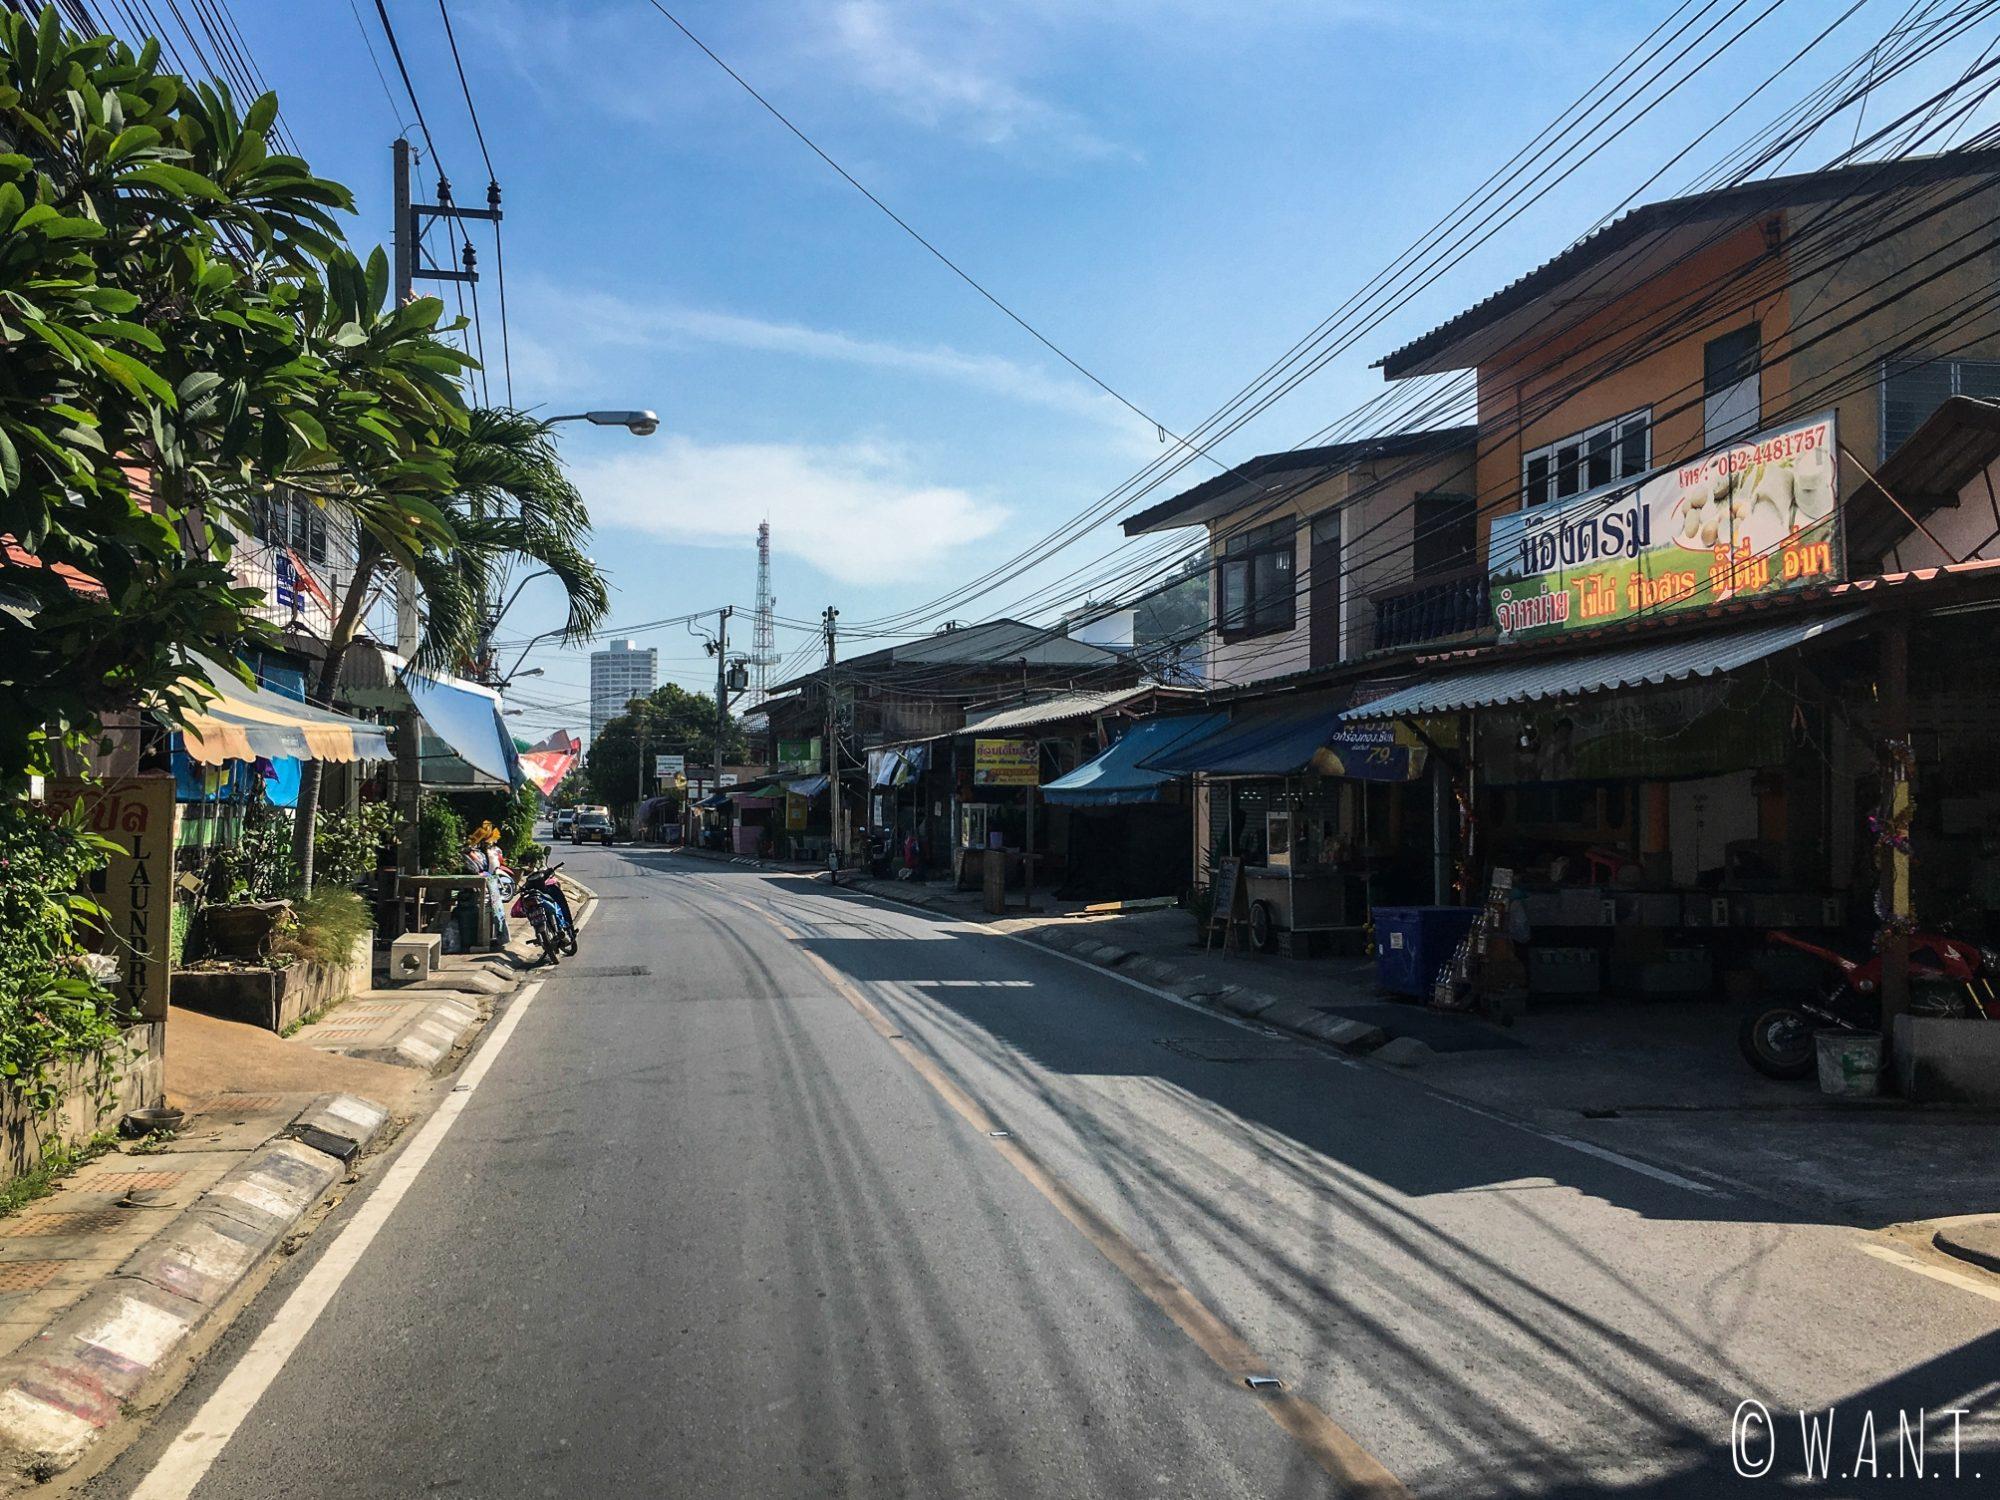 Rue déserte de la ville de Hua Hin